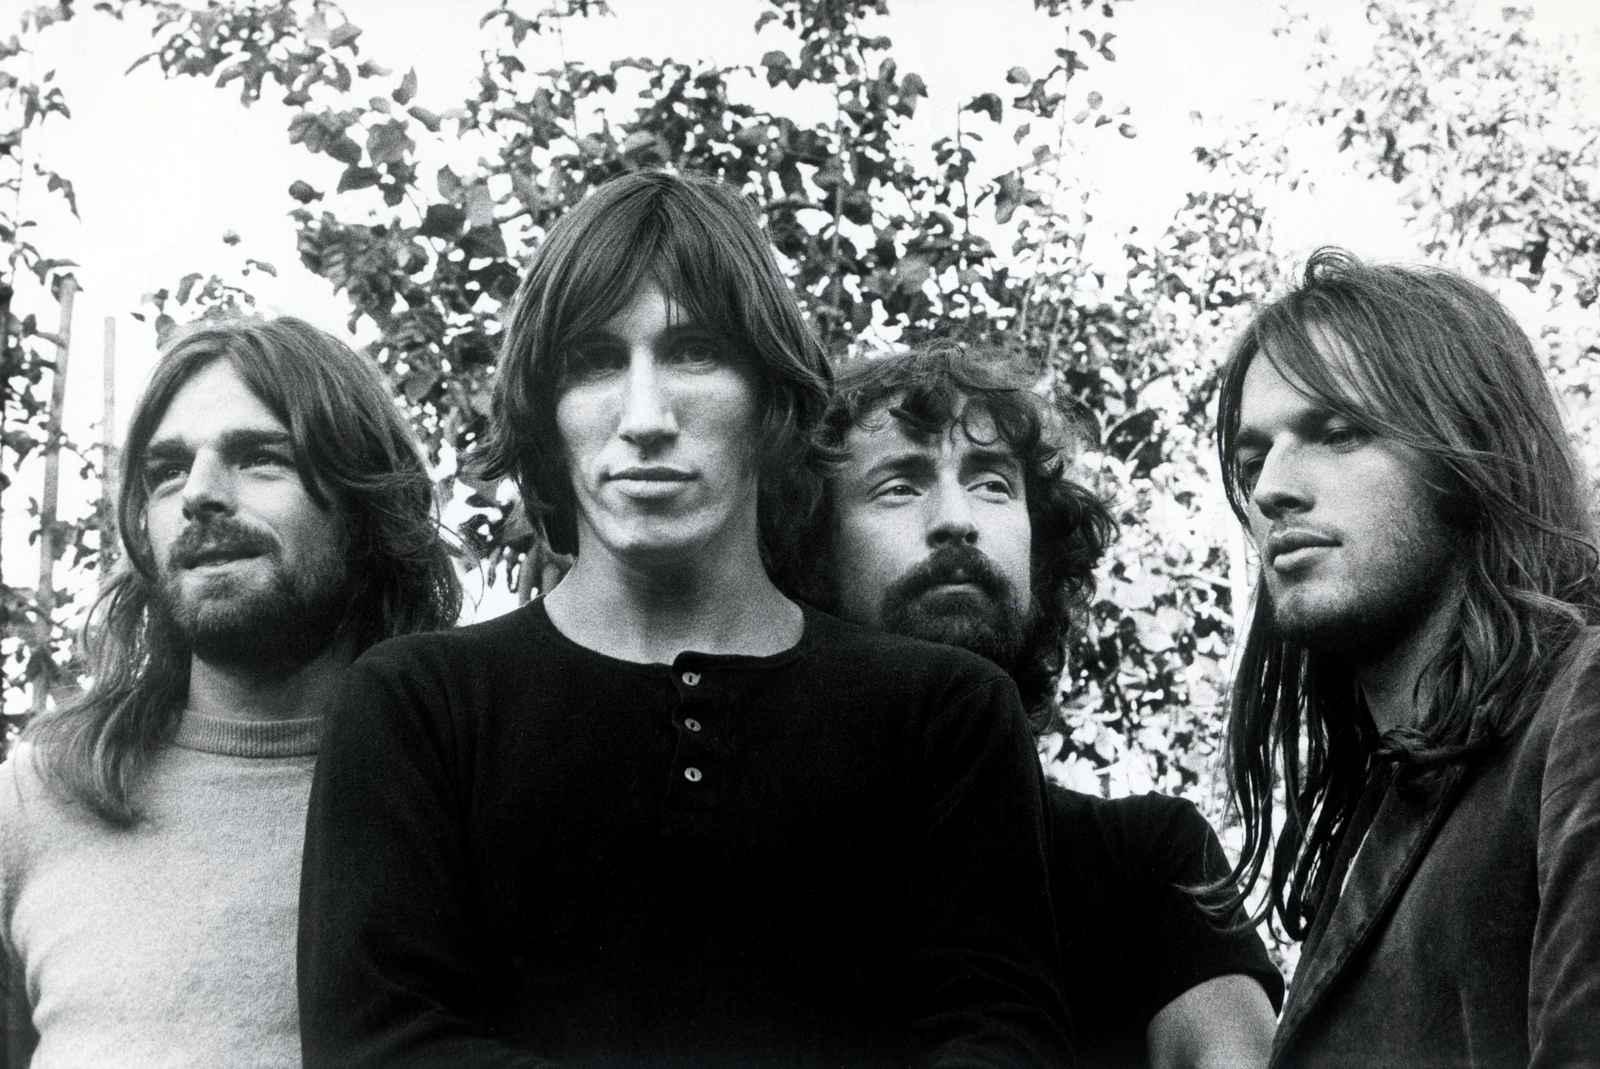 pinkfloyd1973